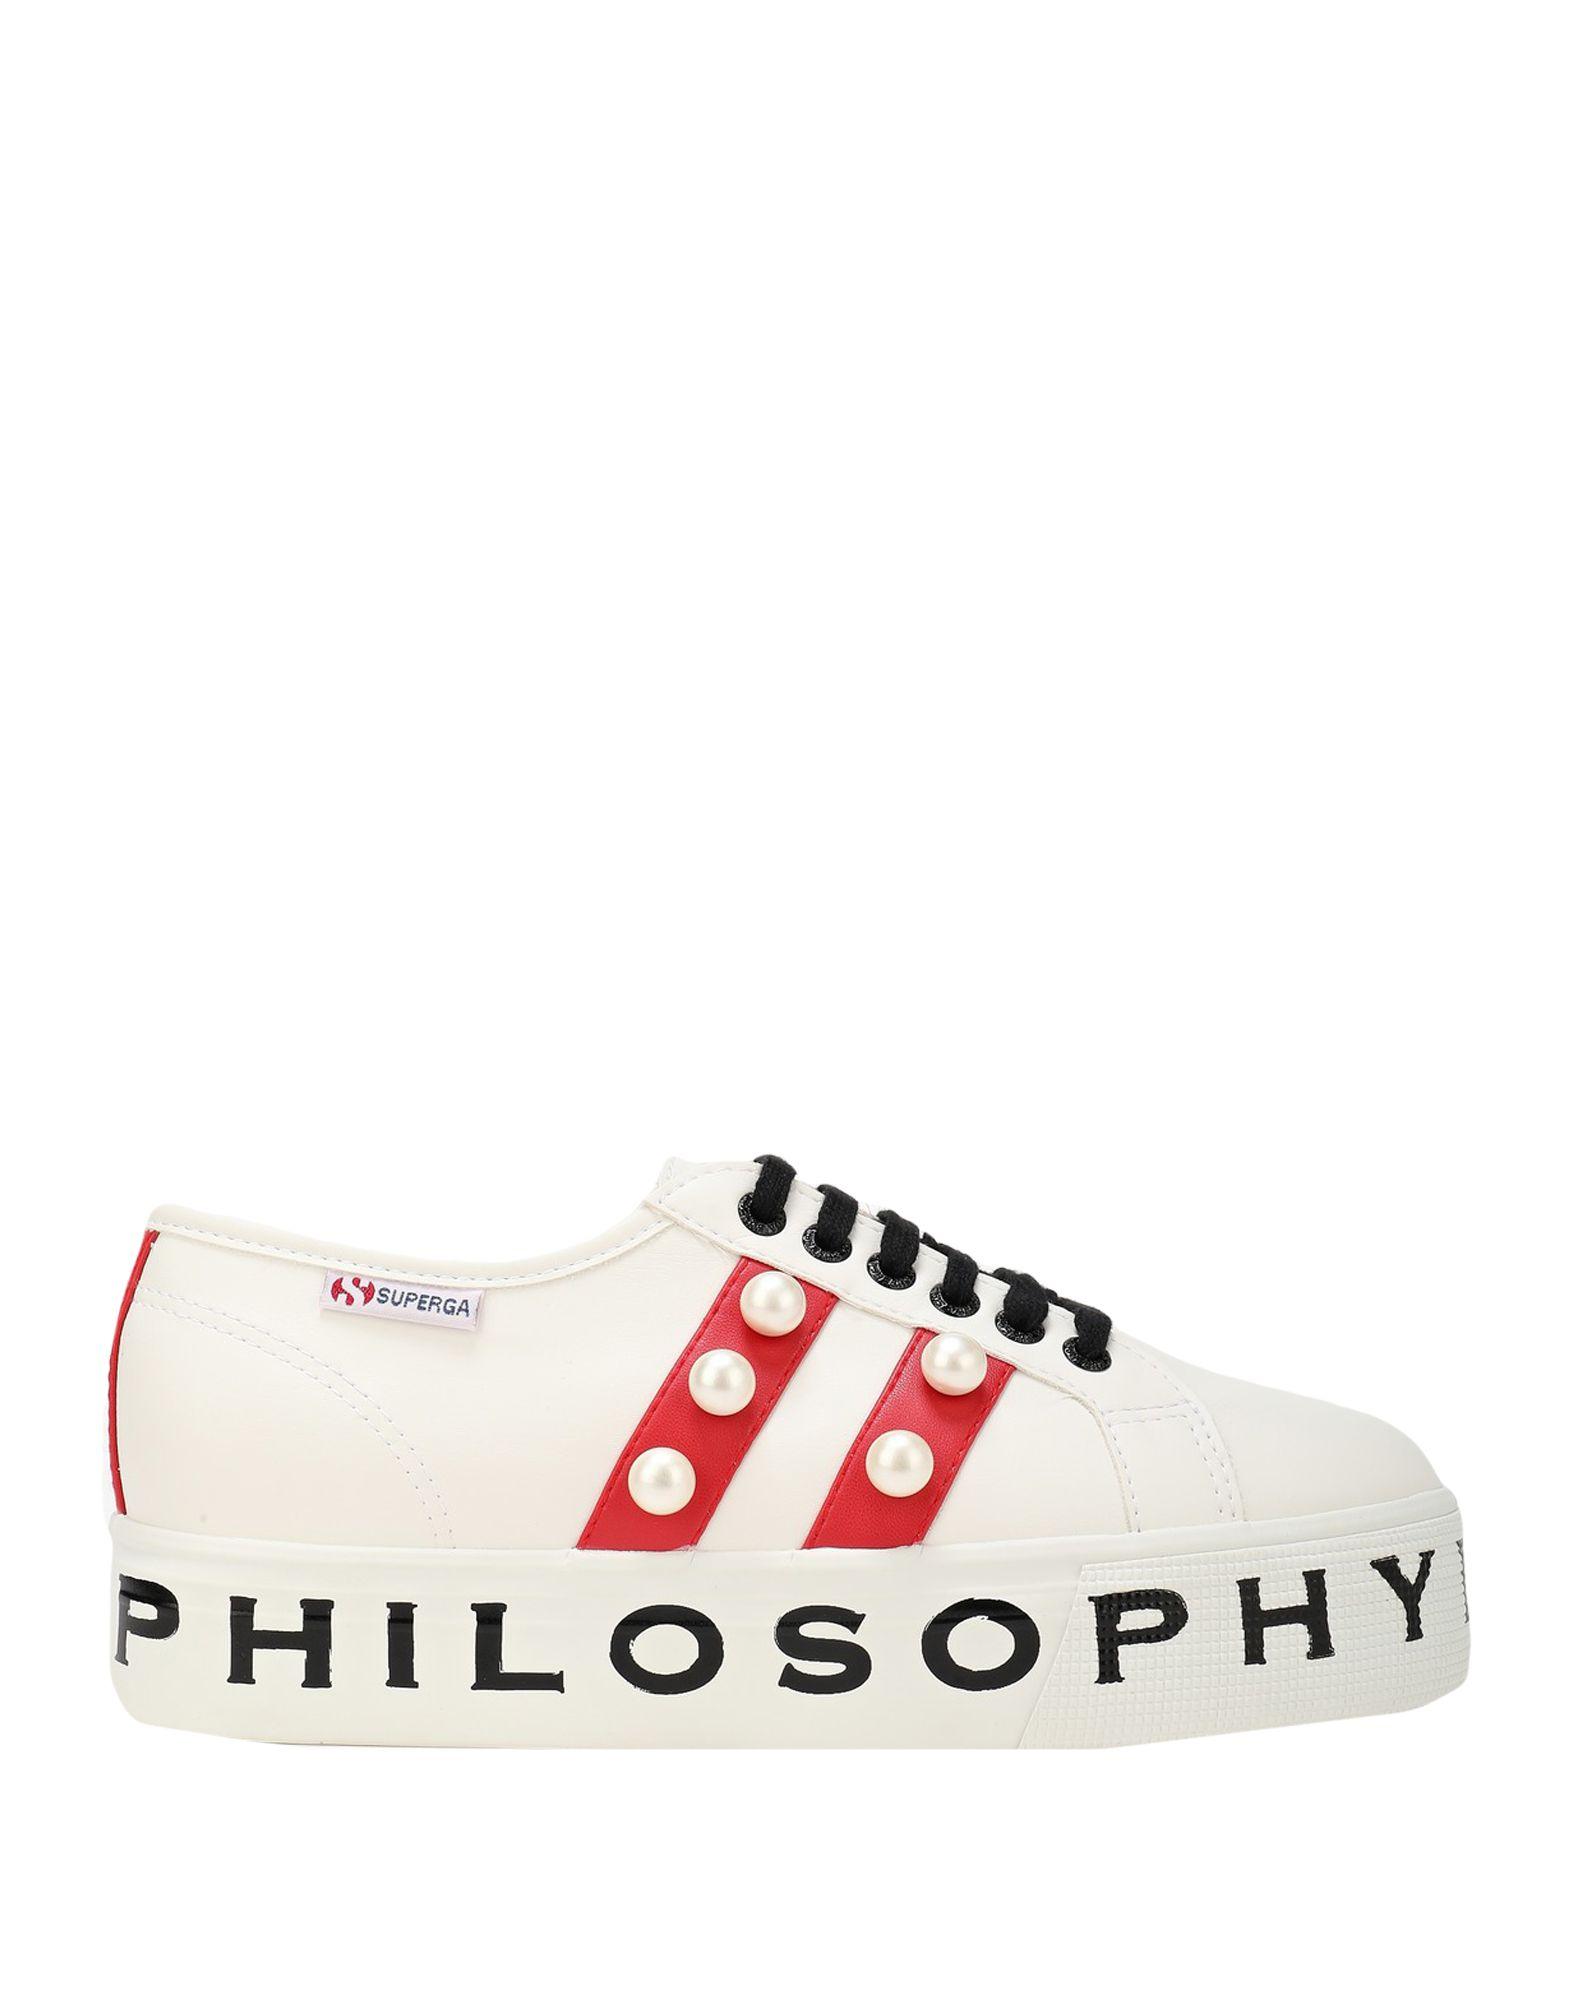 SUPERGA x PHILOSOPHY di LORENZO SERAFINI Низкие кеды и кроссовки superga x philosophy di lorenzo serafini низкие кеды и кроссовки